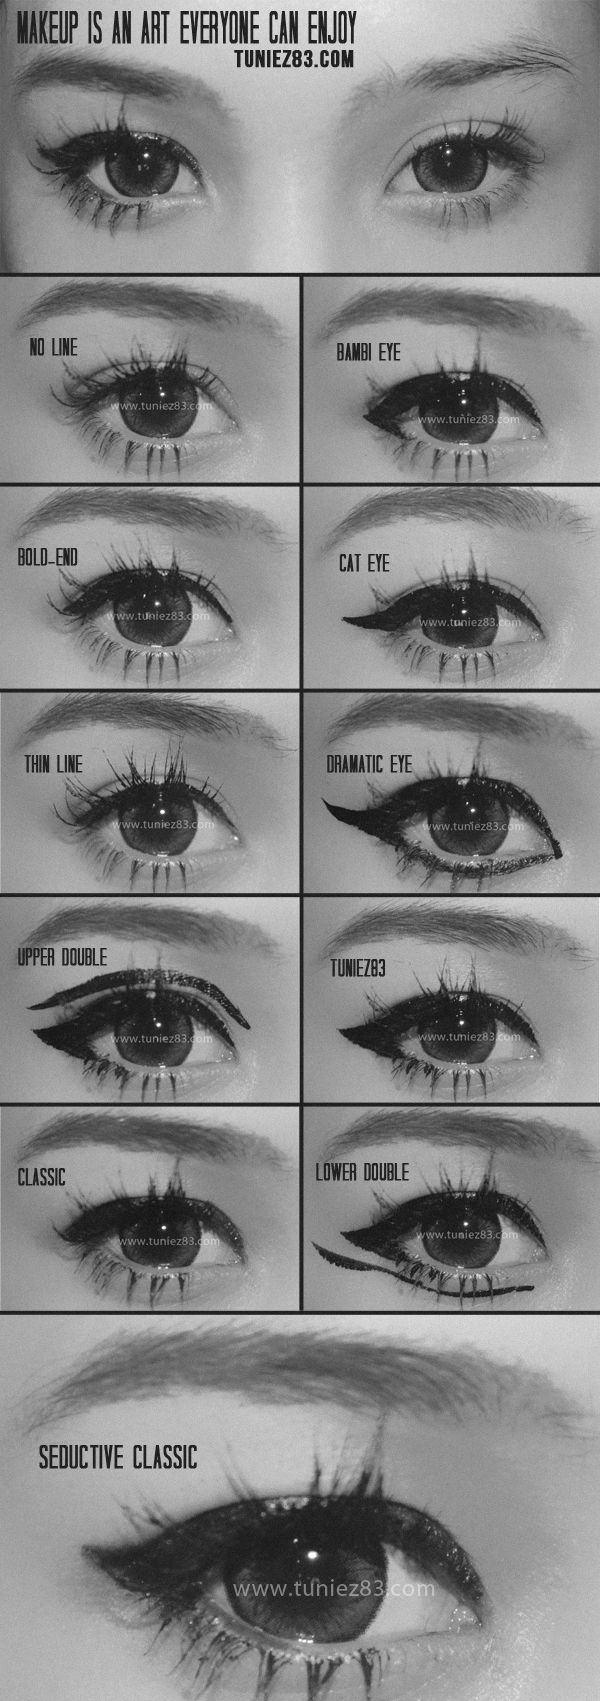 Different eyeliner styles ranging from Bambi Eye Cat Eye Upper